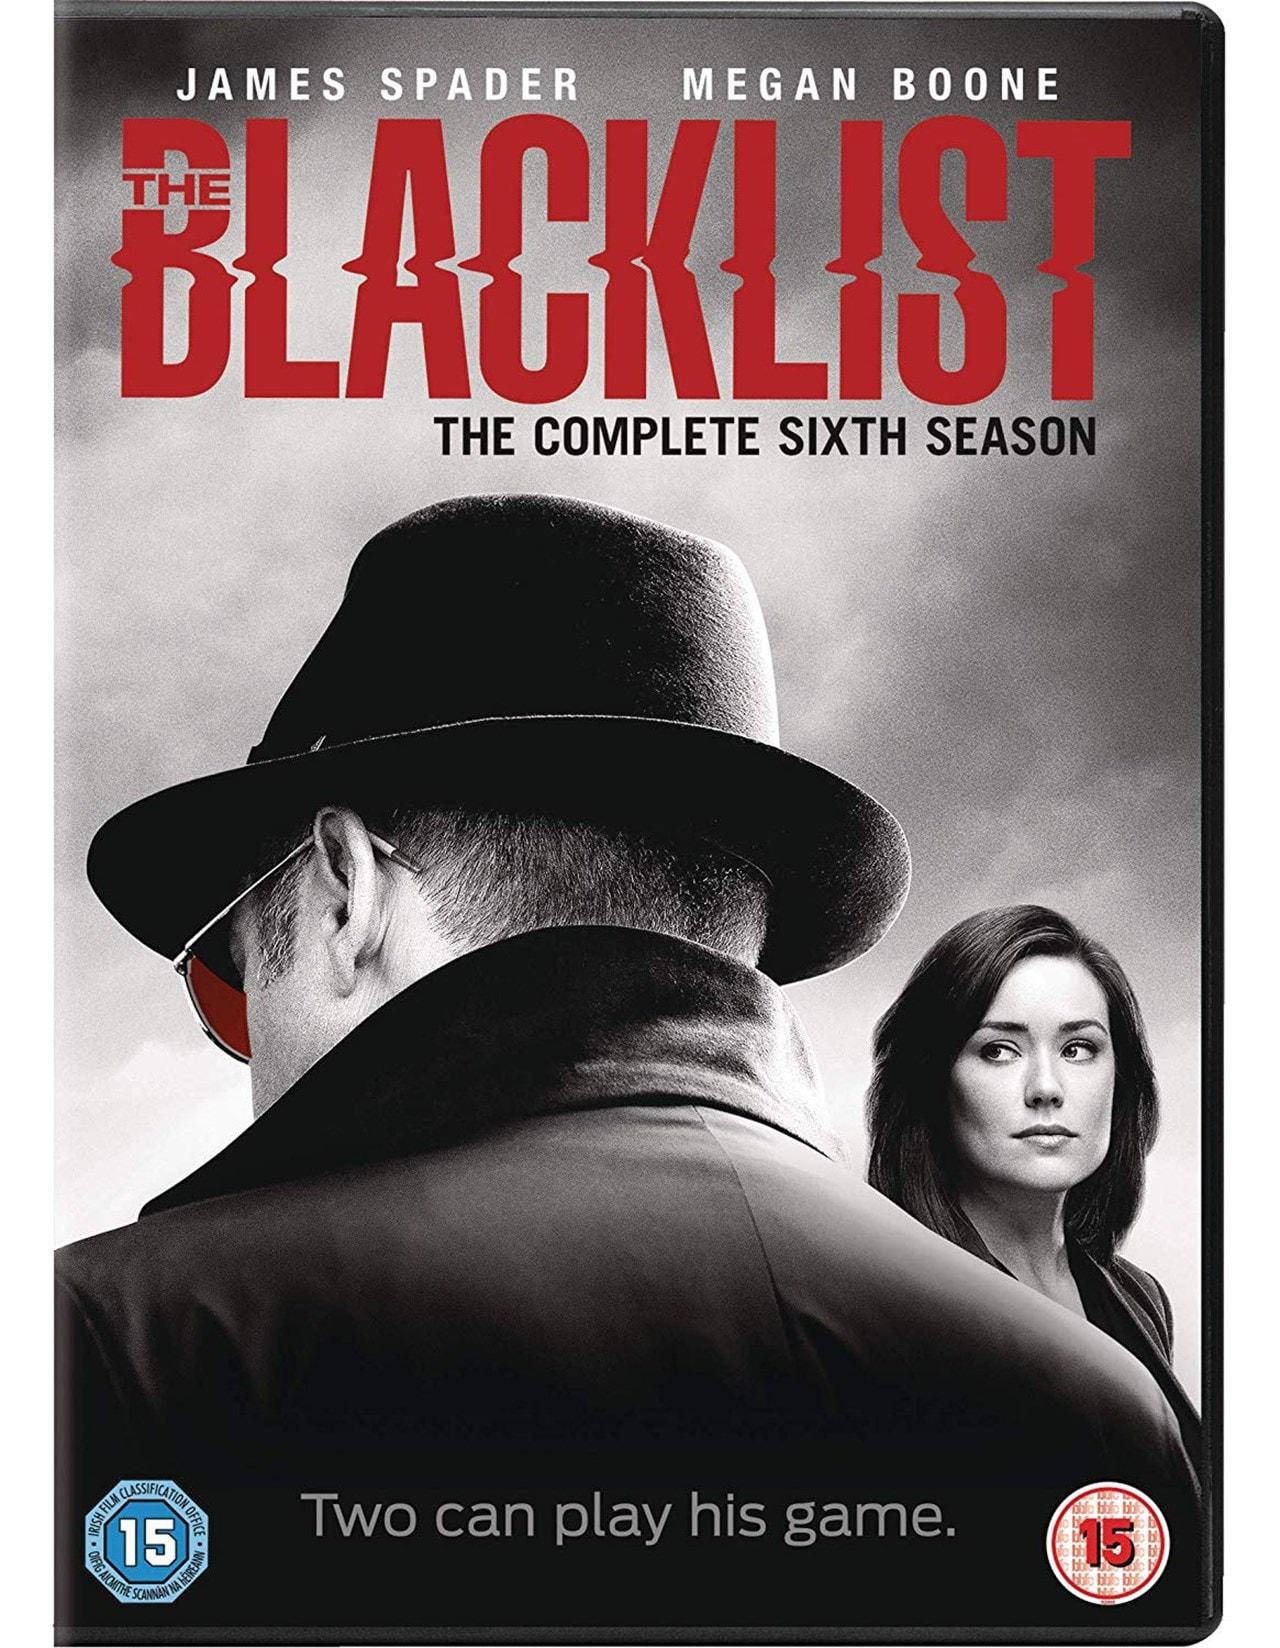 The Blacklist: The Complete Sixth Season - 1